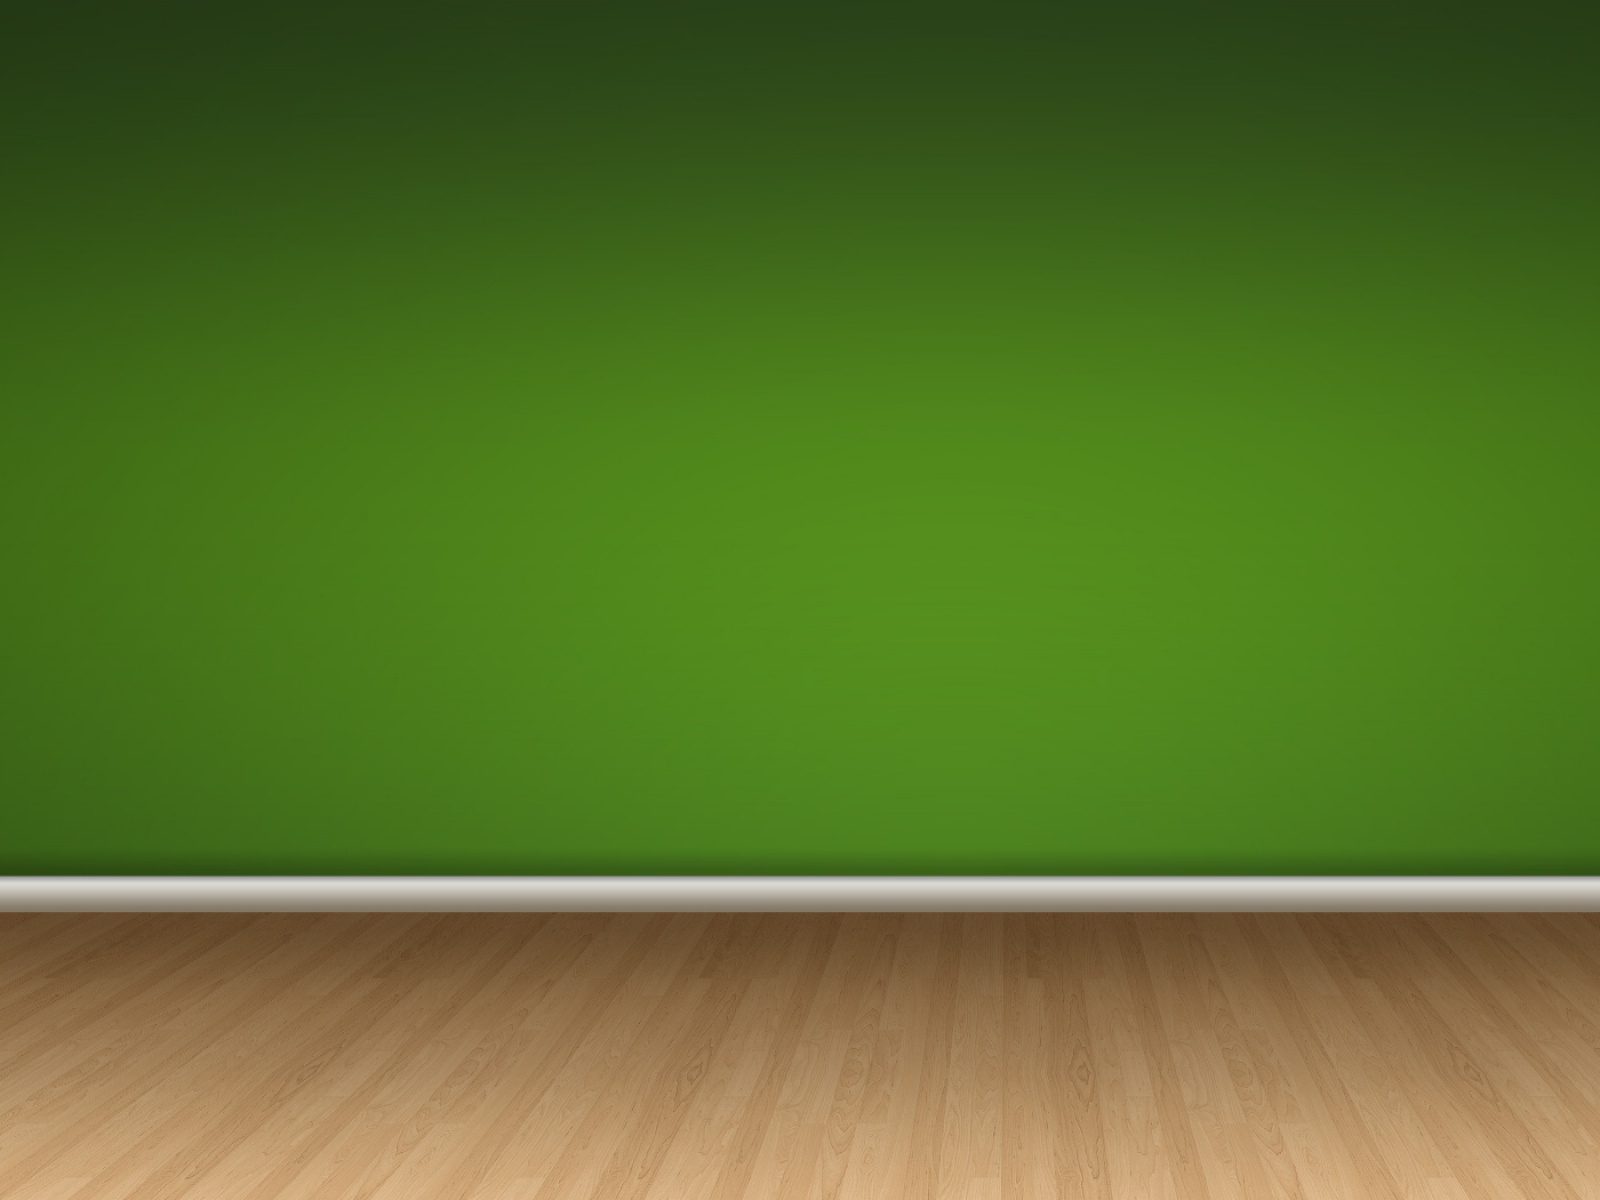 chinese living room wall with wood floor wood floor wall 1600x1200